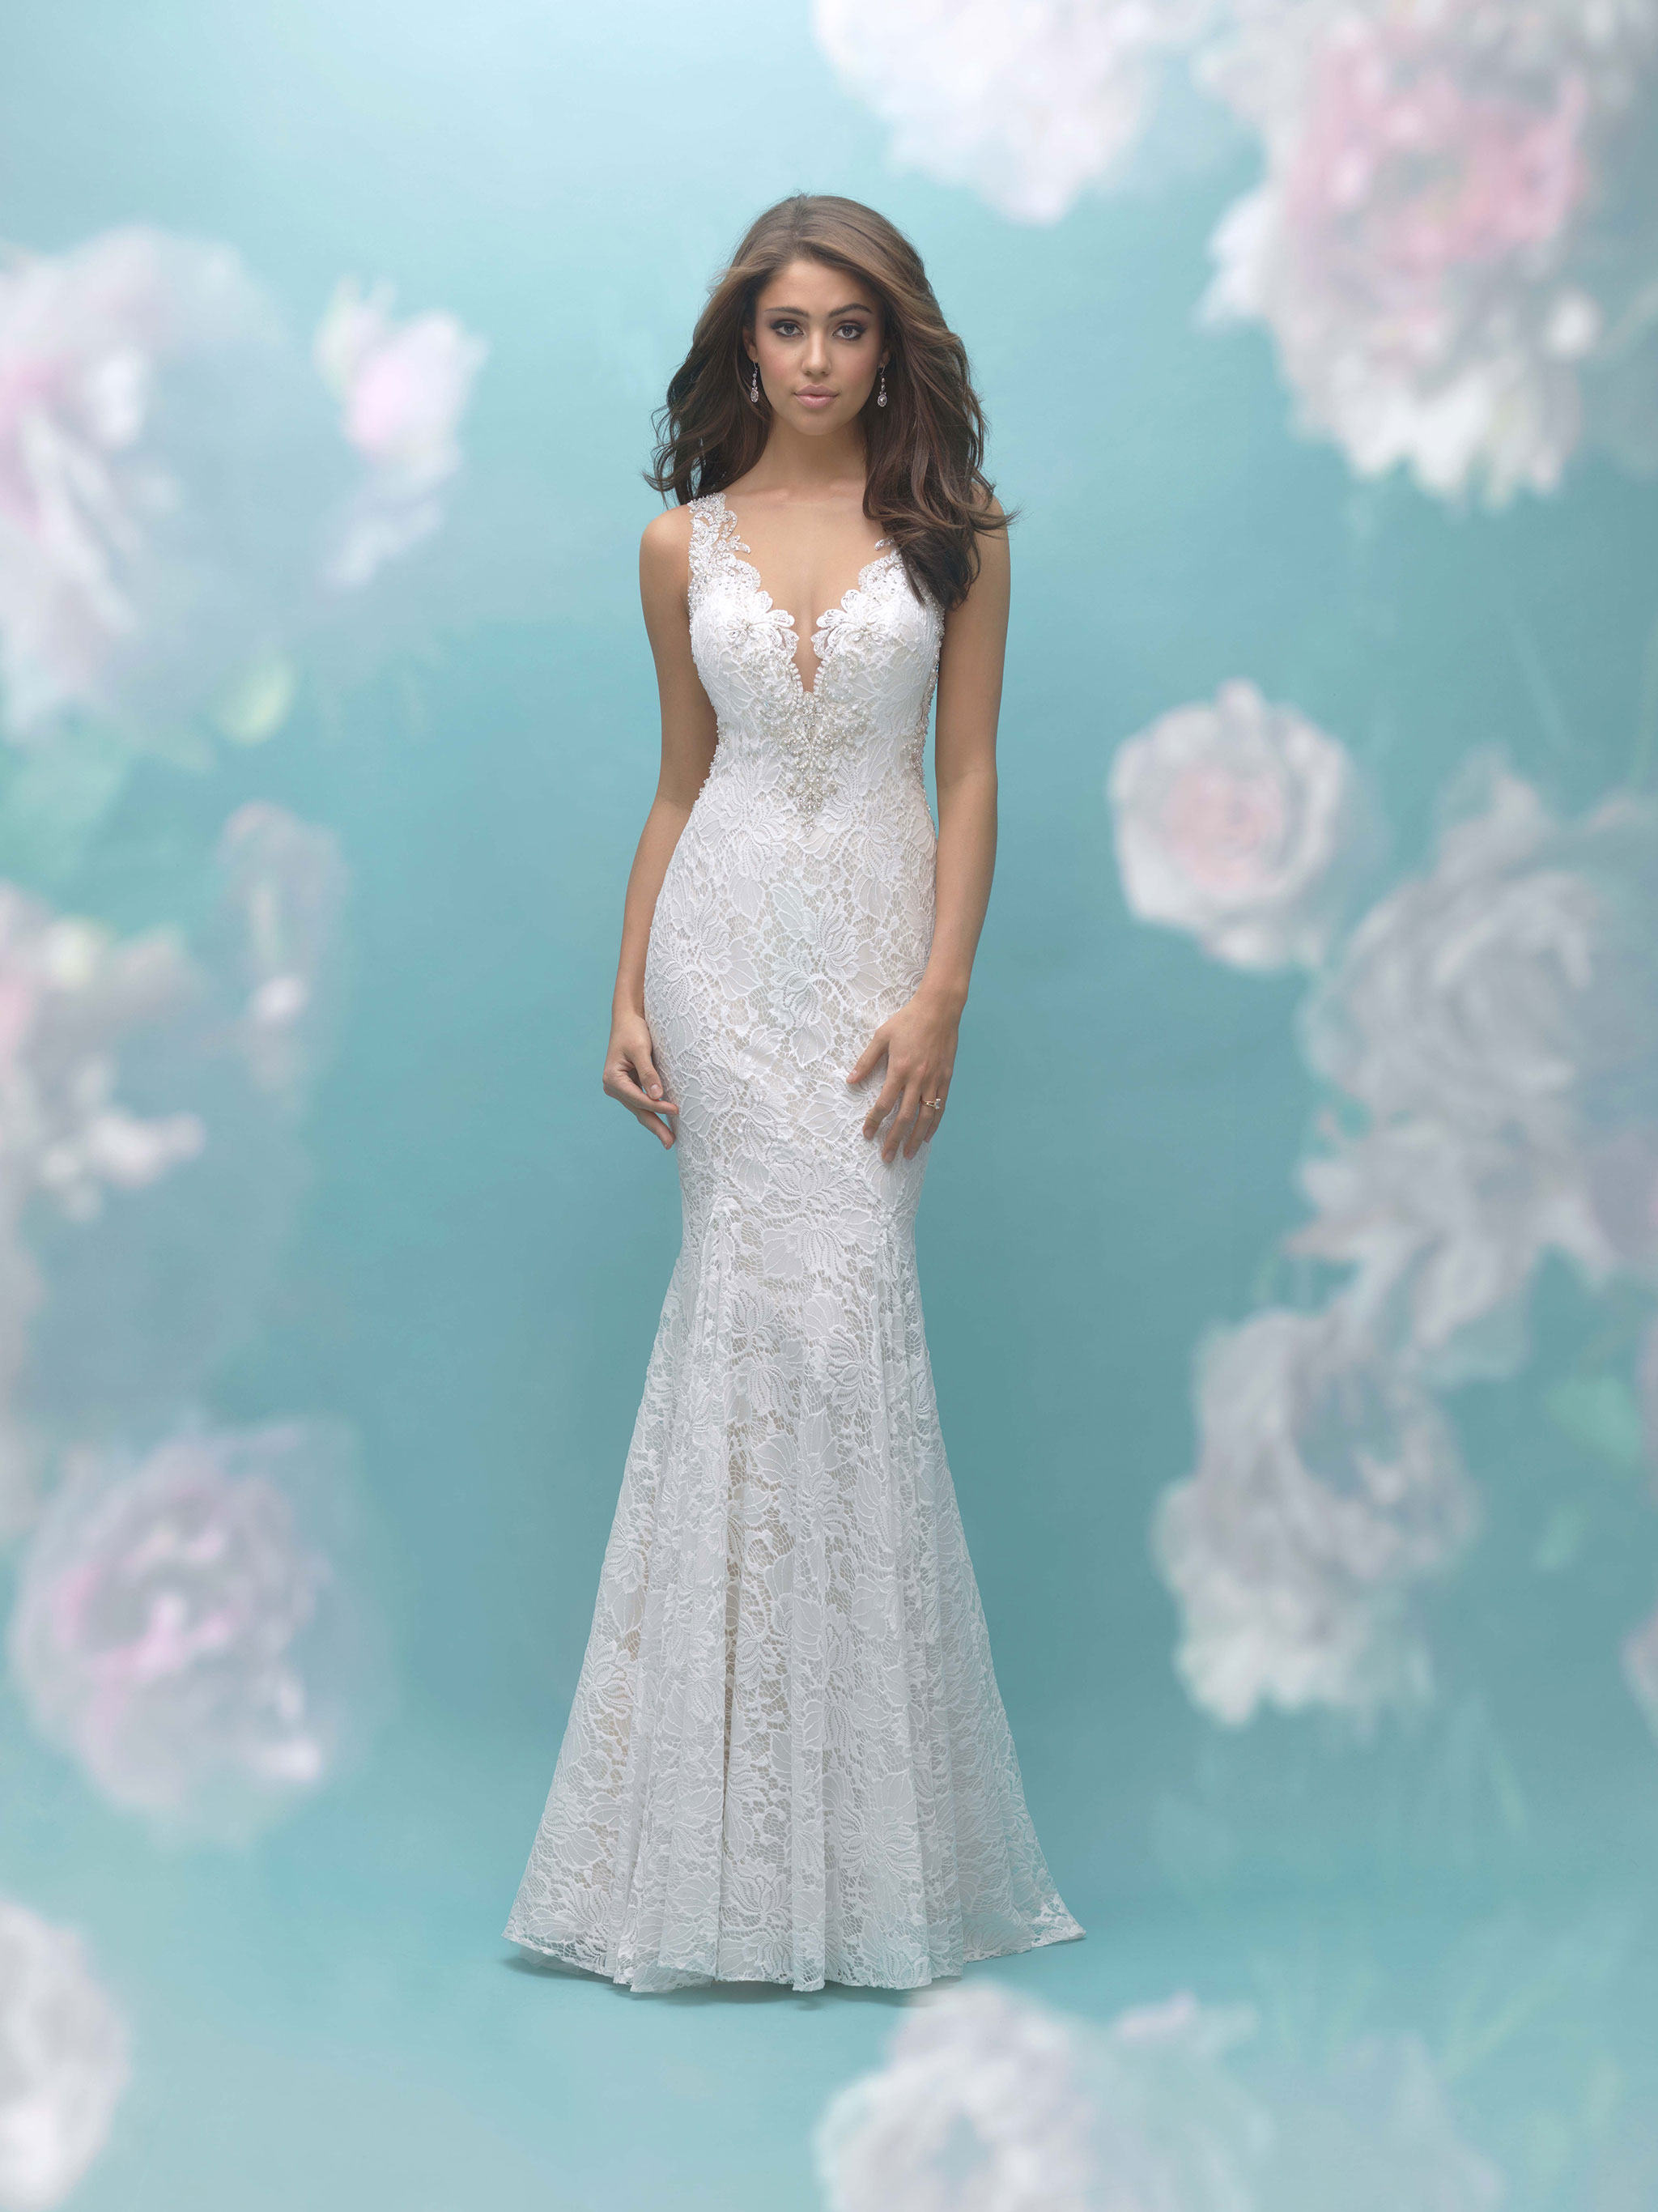 Funky Bridesmaid Dresses Newry Motif - All Wedding Dresses ...